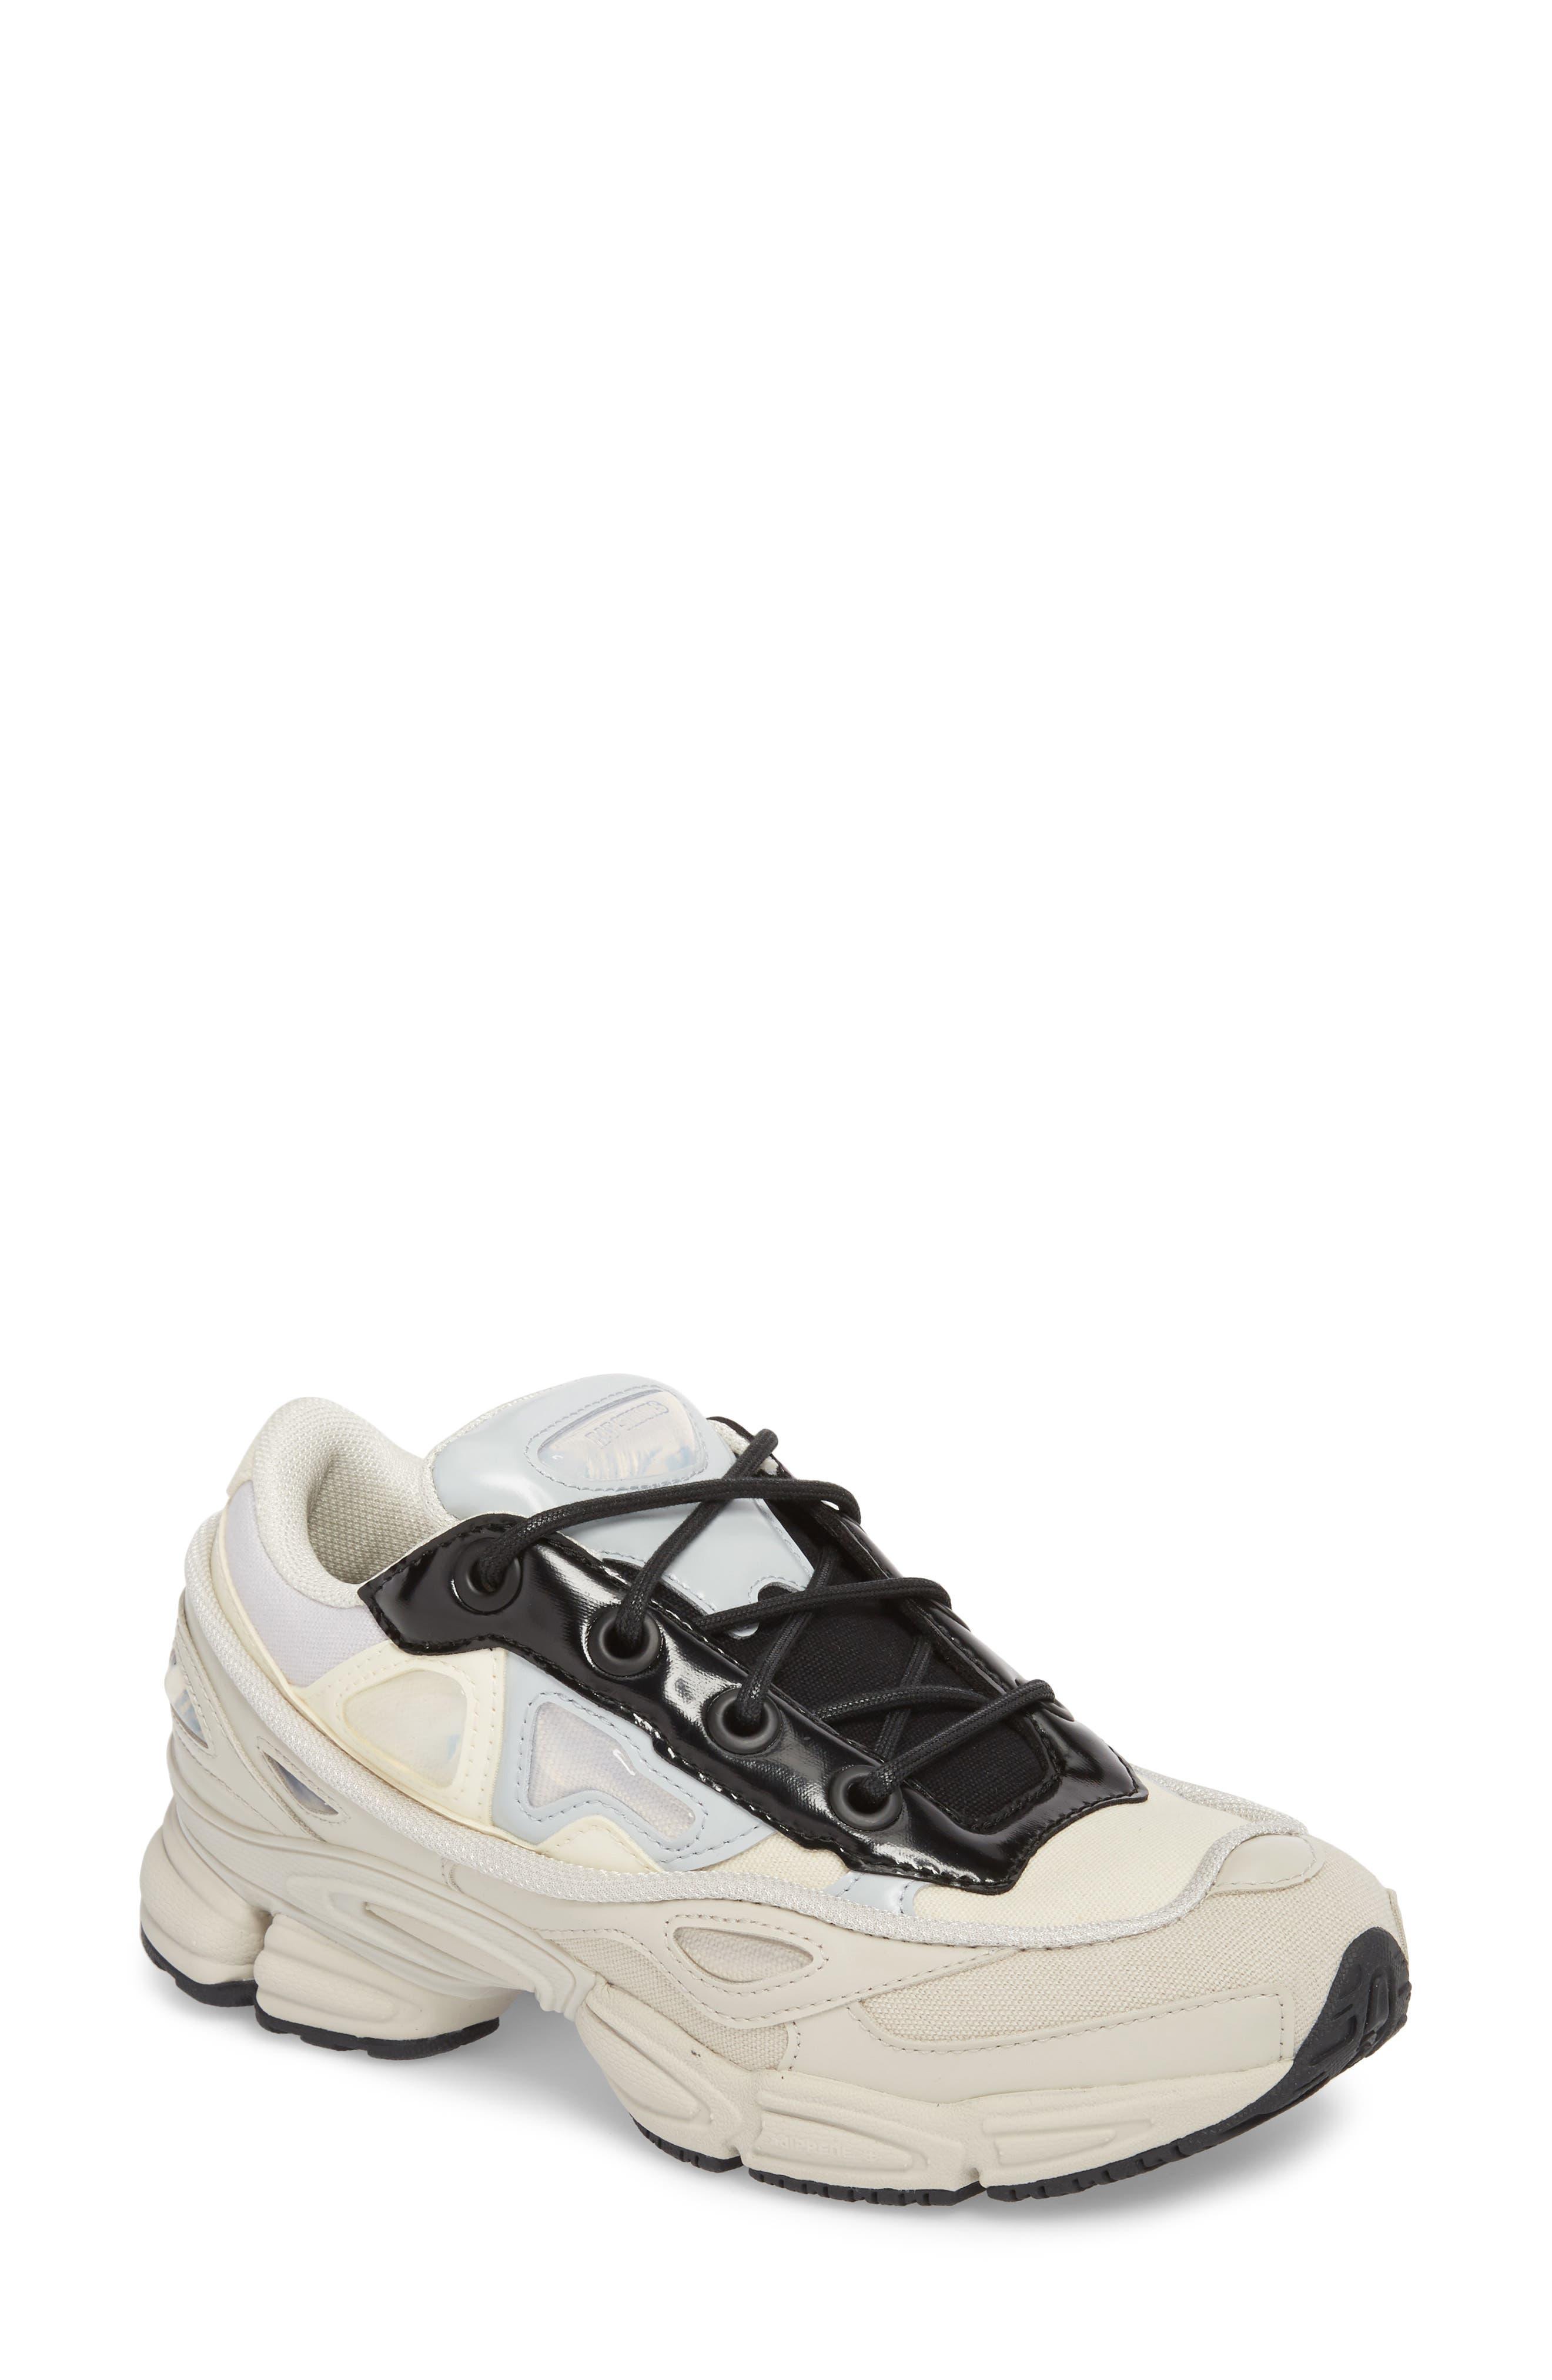 adidas by Raf Simons Ozweego III Sneaker,                             Main thumbnail 1, color,                             150